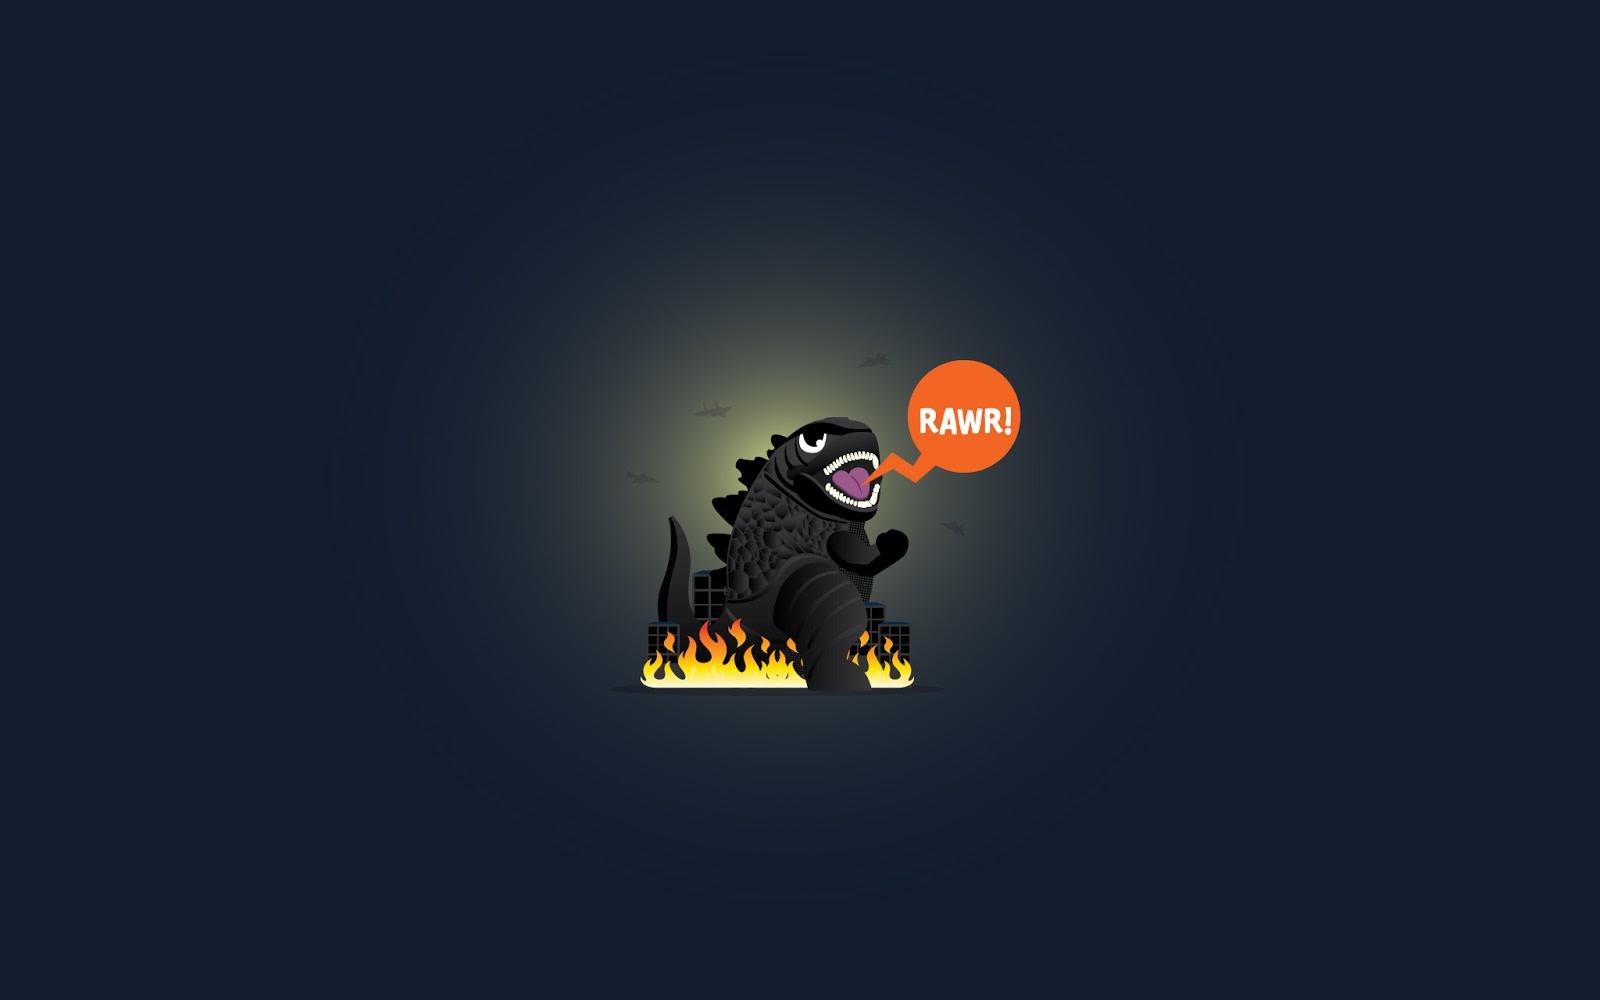 cheechingycom [Wallpaper] Hello Im Godzilla rawr 1600x1000